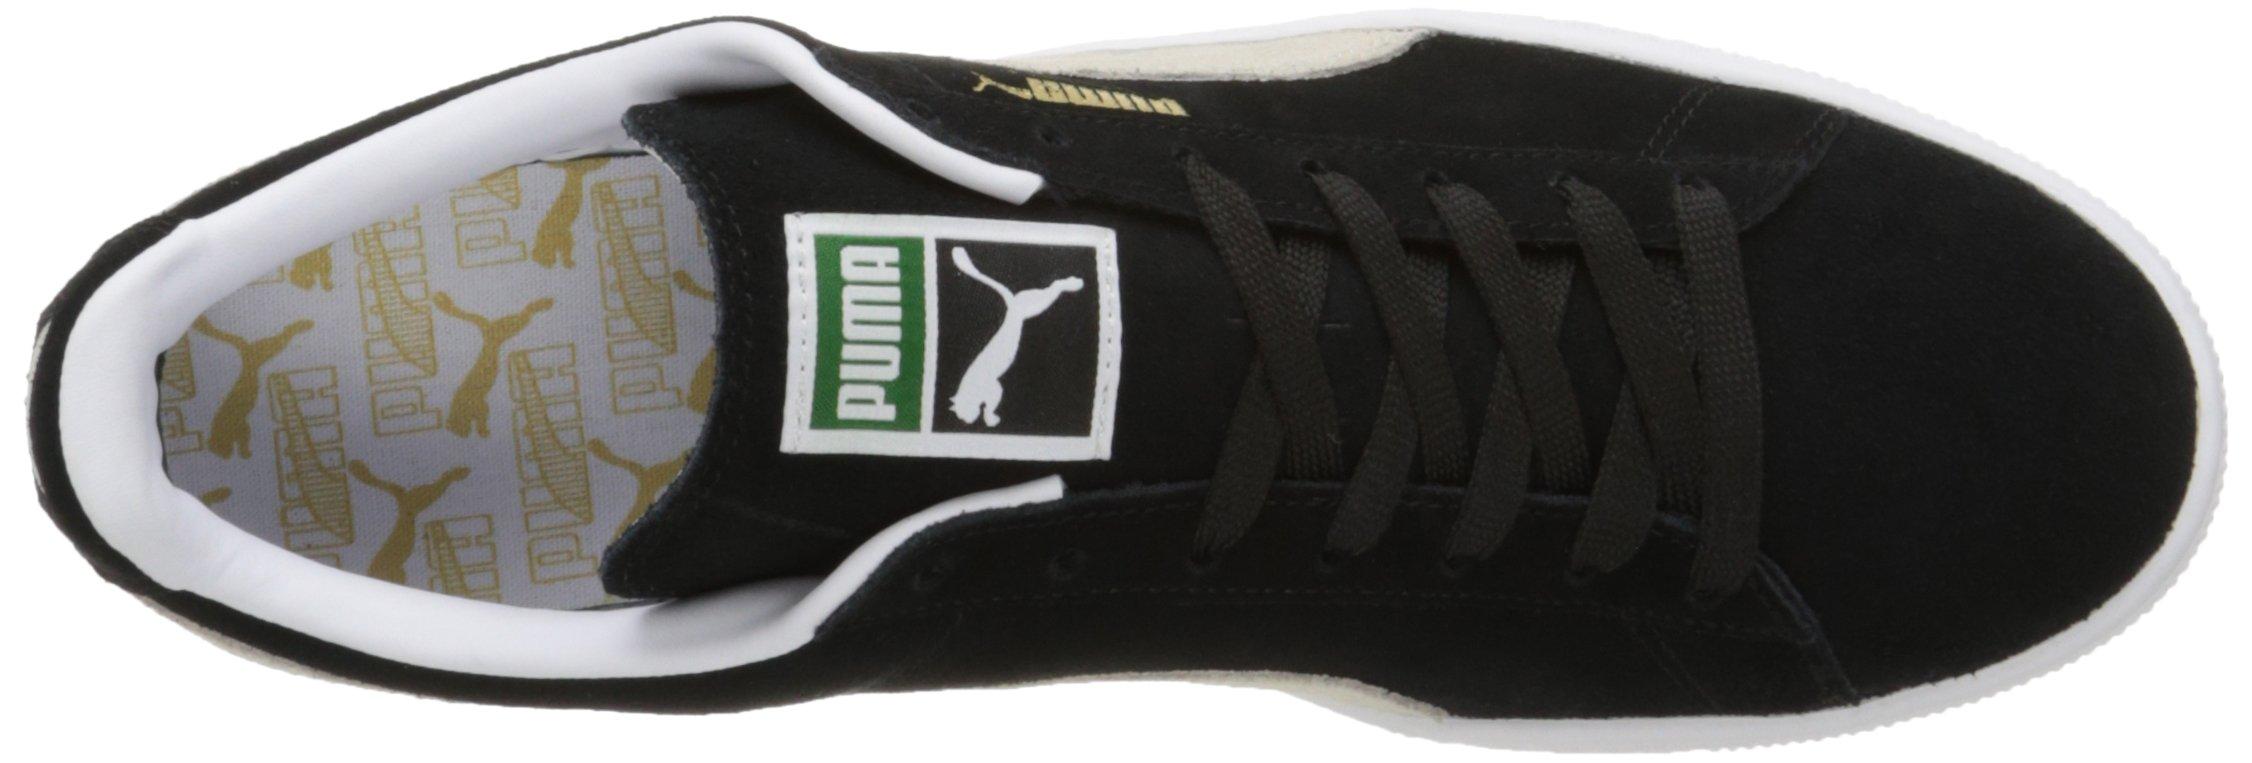 PUMA Suede Classic Sneaker,Black/White,9.5 M US Men's by PUMA (Image #11)